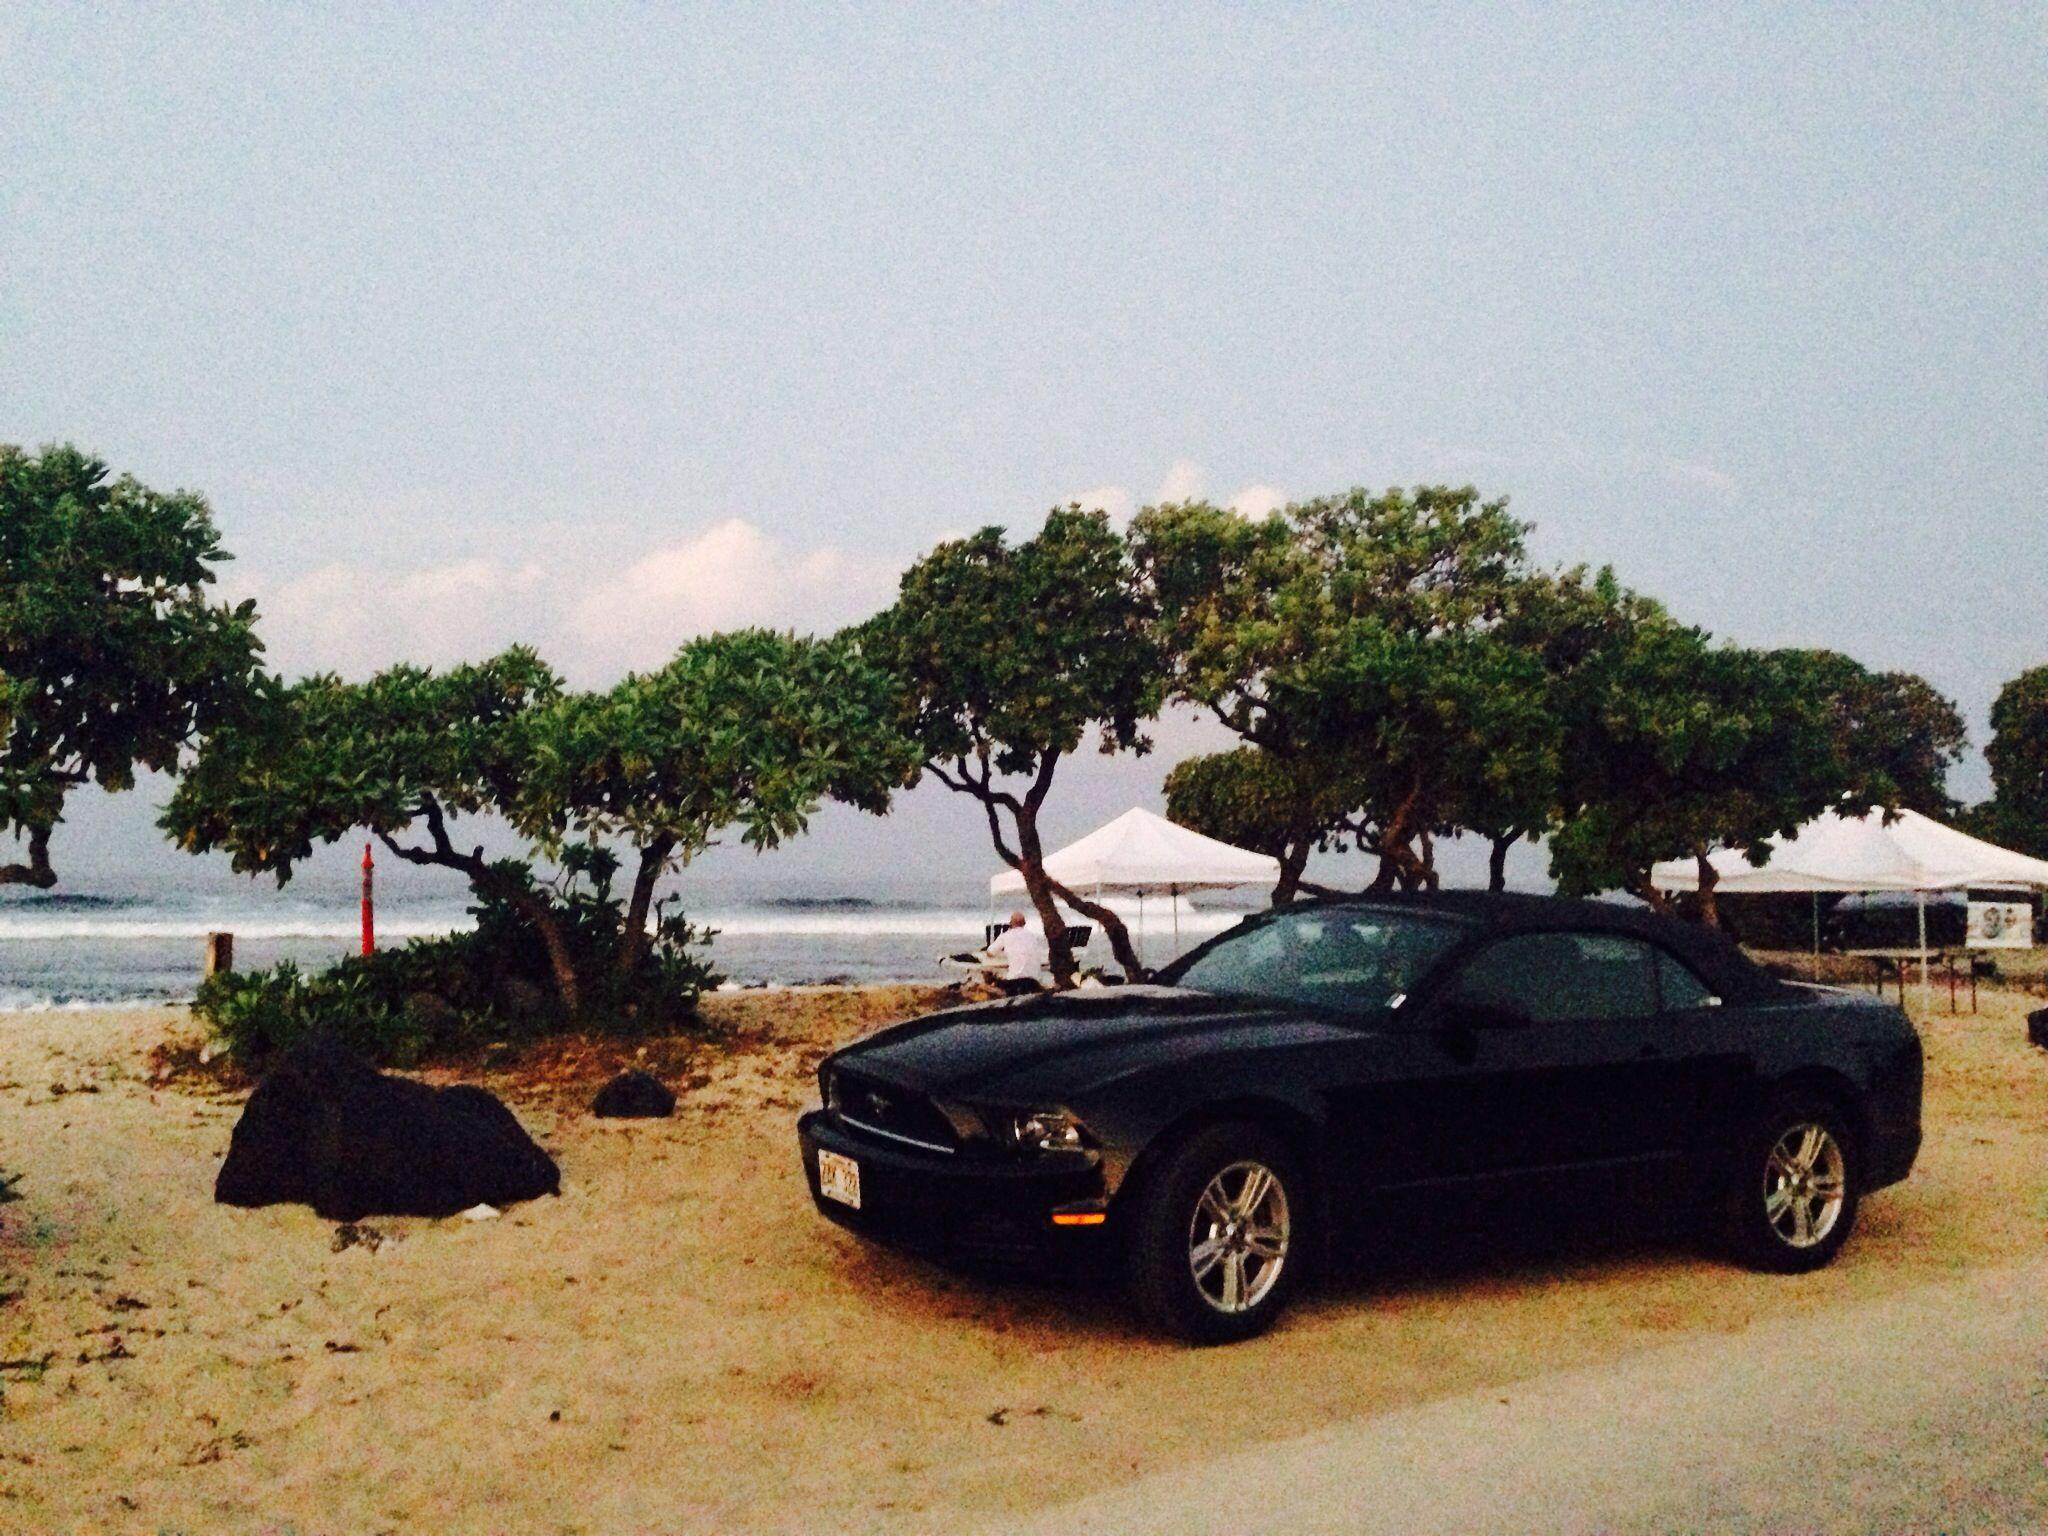 Mustang Convertible Hawaii Car Rental Mustang Convertible Car